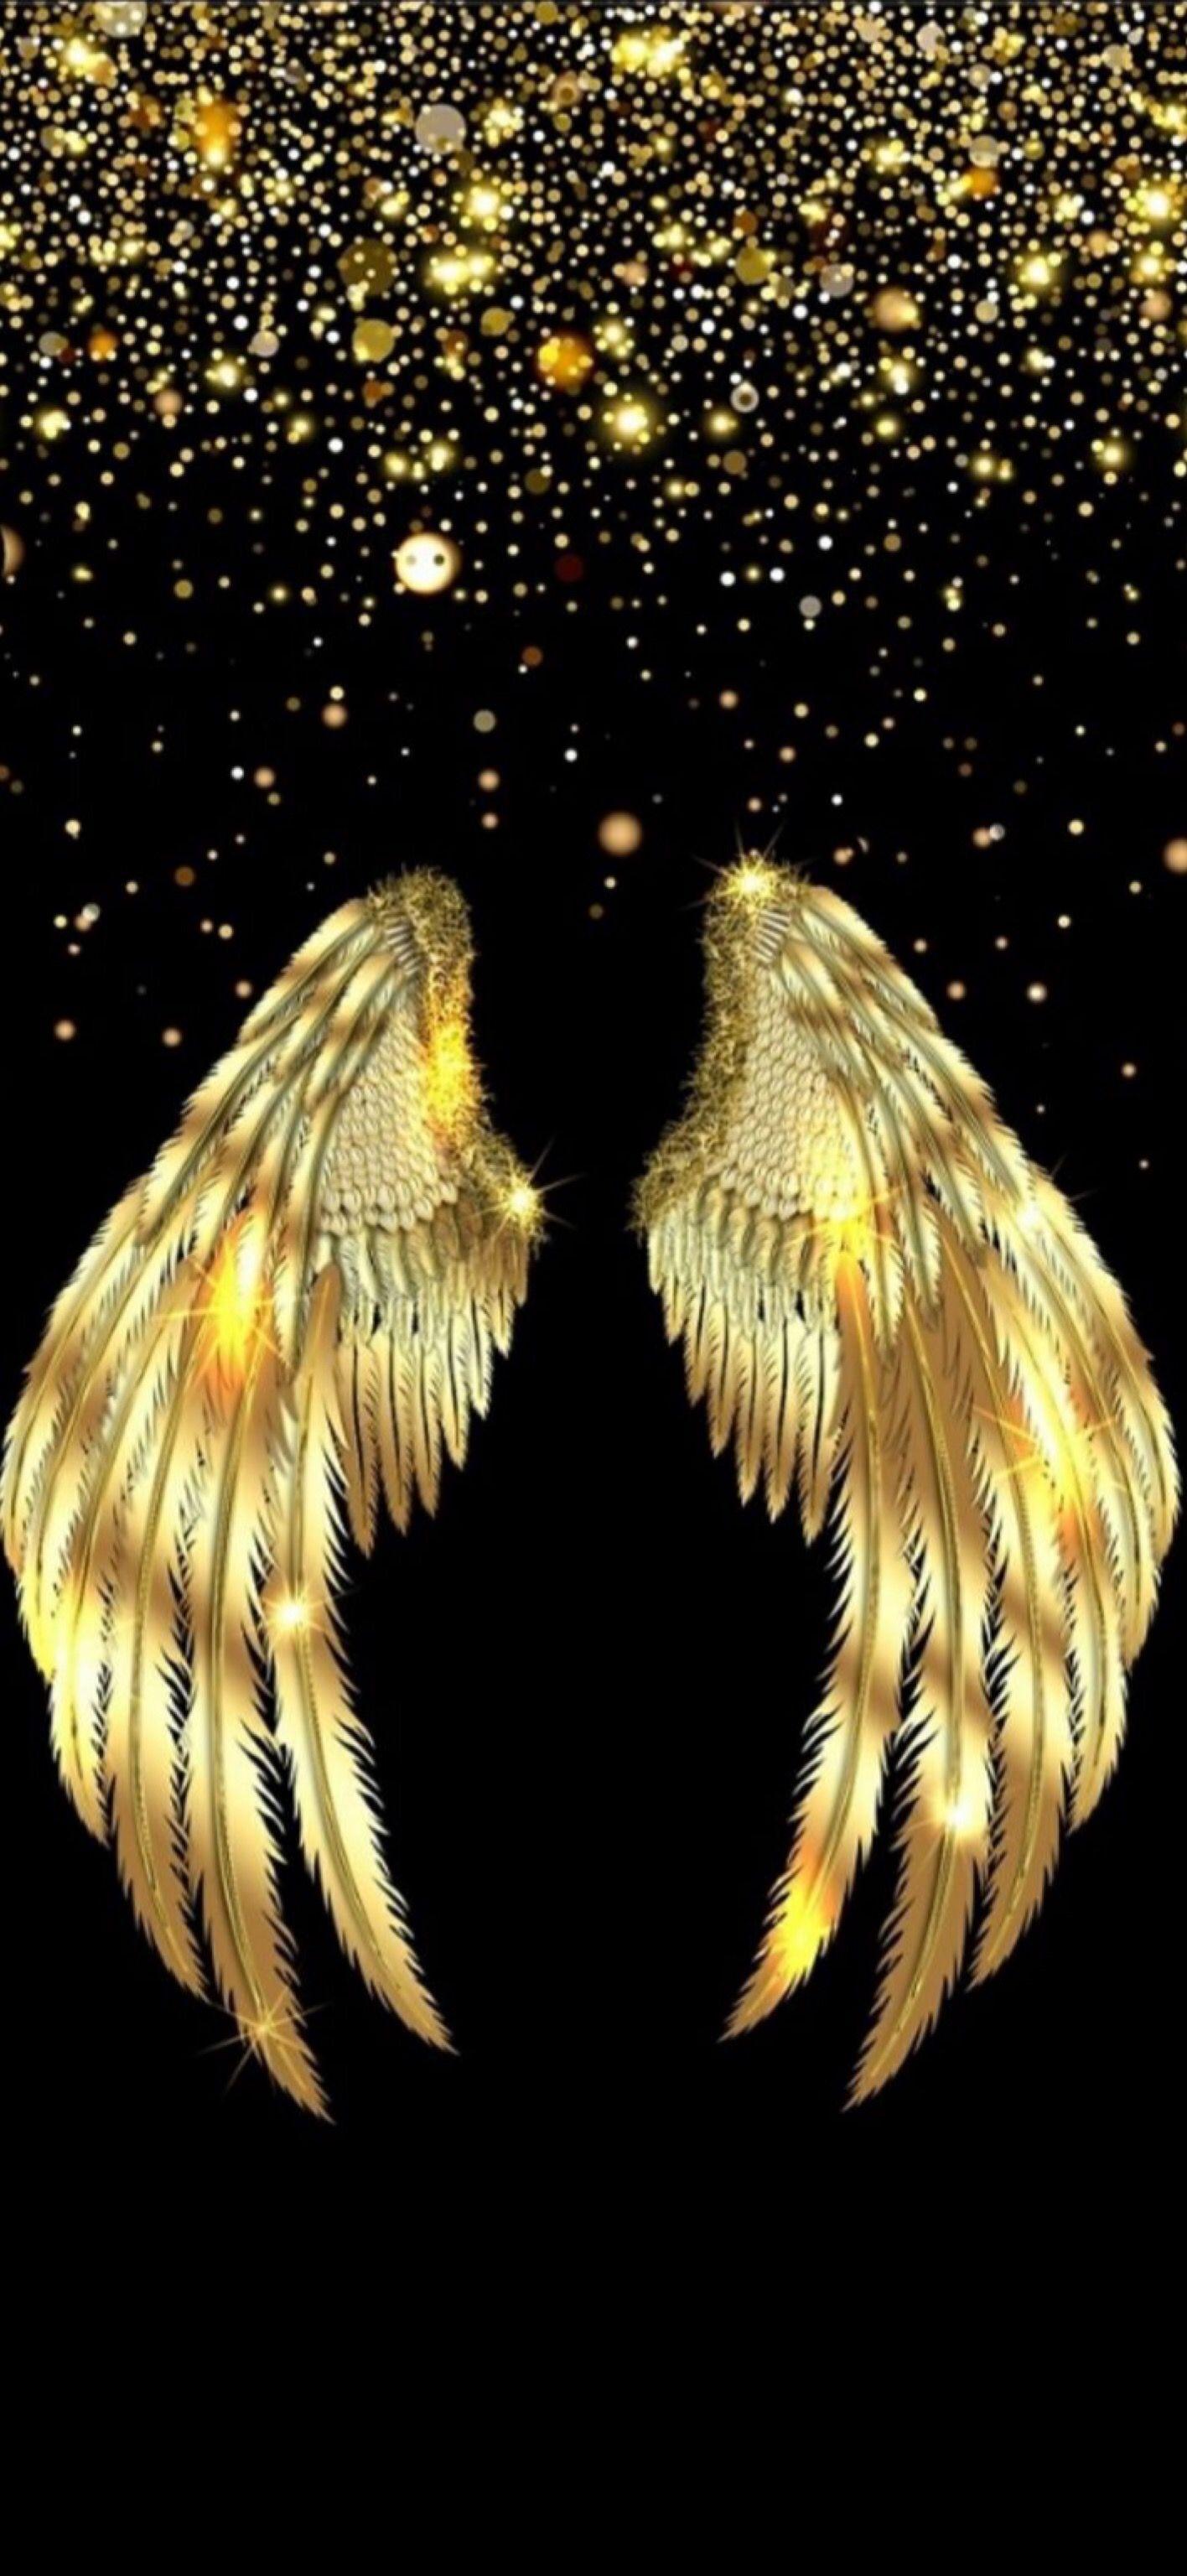 Angel Wings Neon Sign Neon Signs Wings Wallpaper Neon Wallpaper